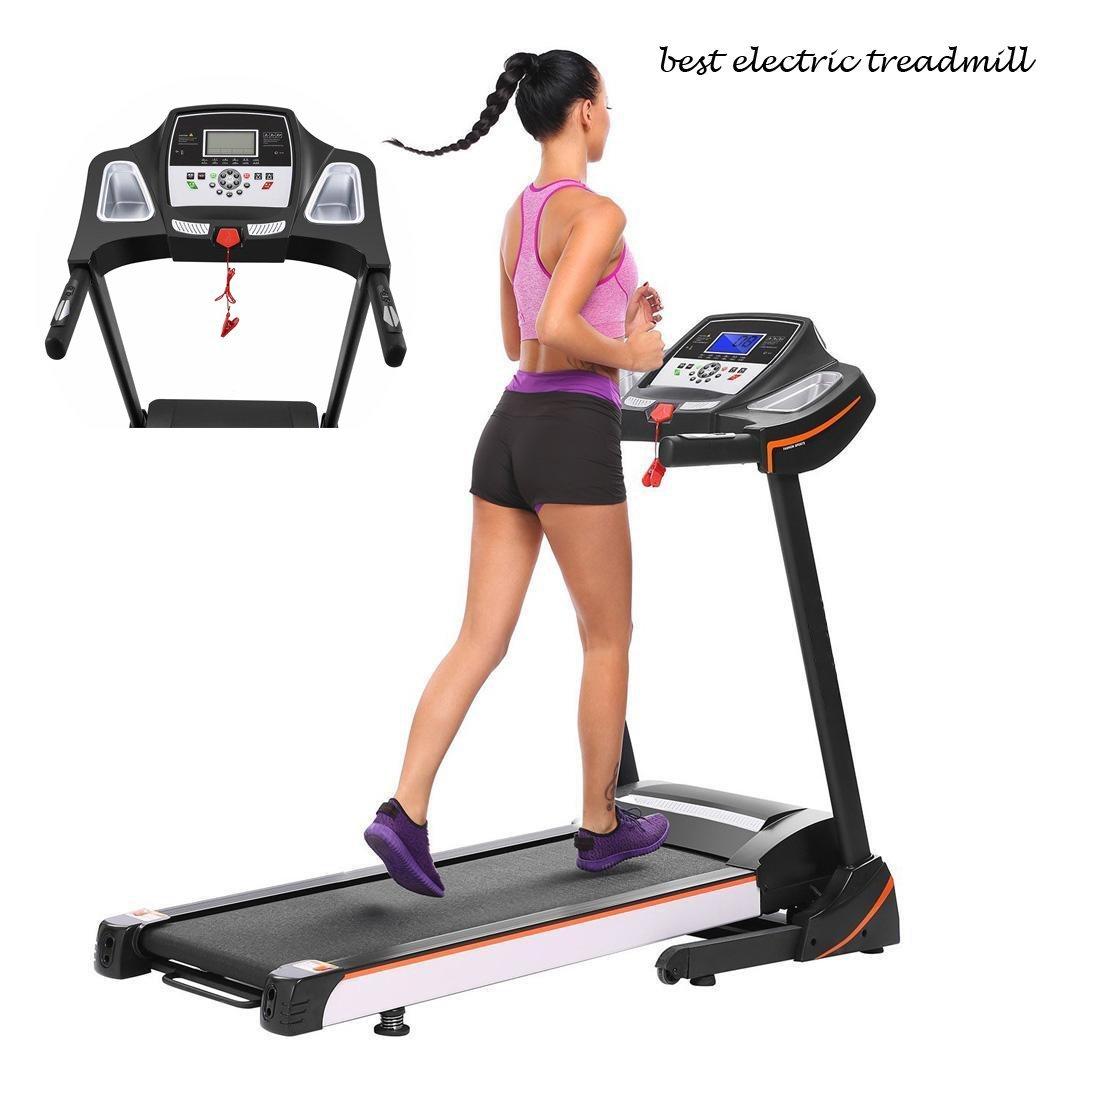 Cheap 3 Hp Treadmill, find 3 Hp Treadmill deals on line at Alibaba com